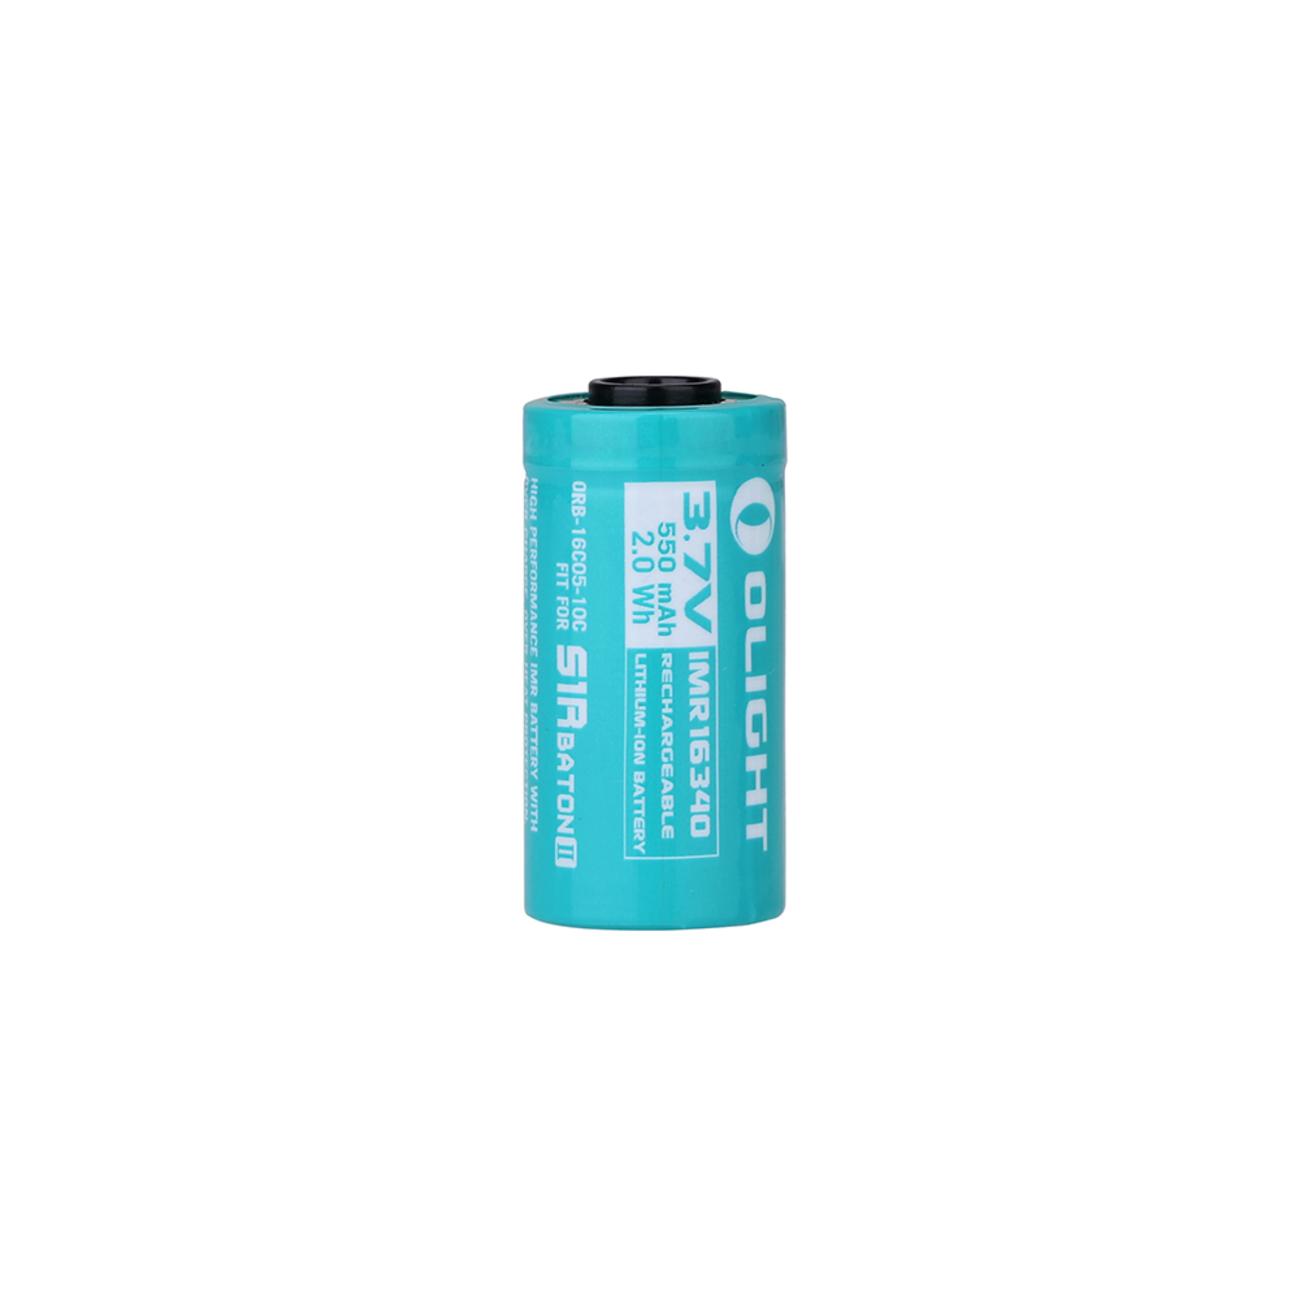 Olight Pin 550mAh IMR16340 Battery for S1R Baton II